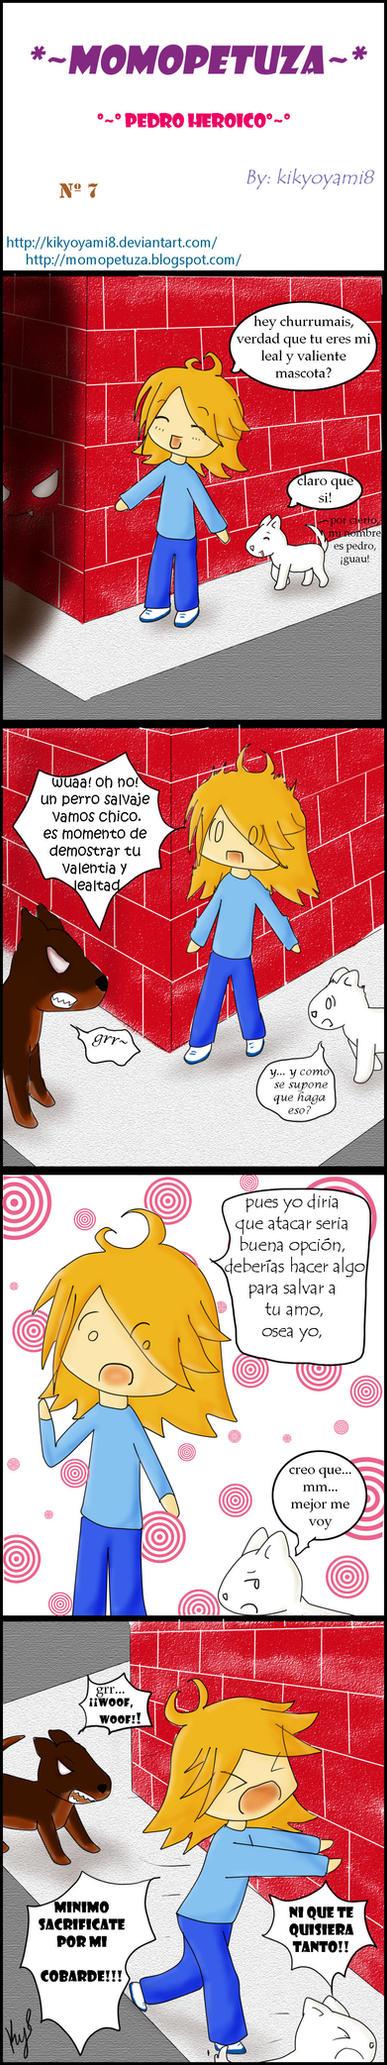 momopetuza tira7-perro heroico by kikyoyami8